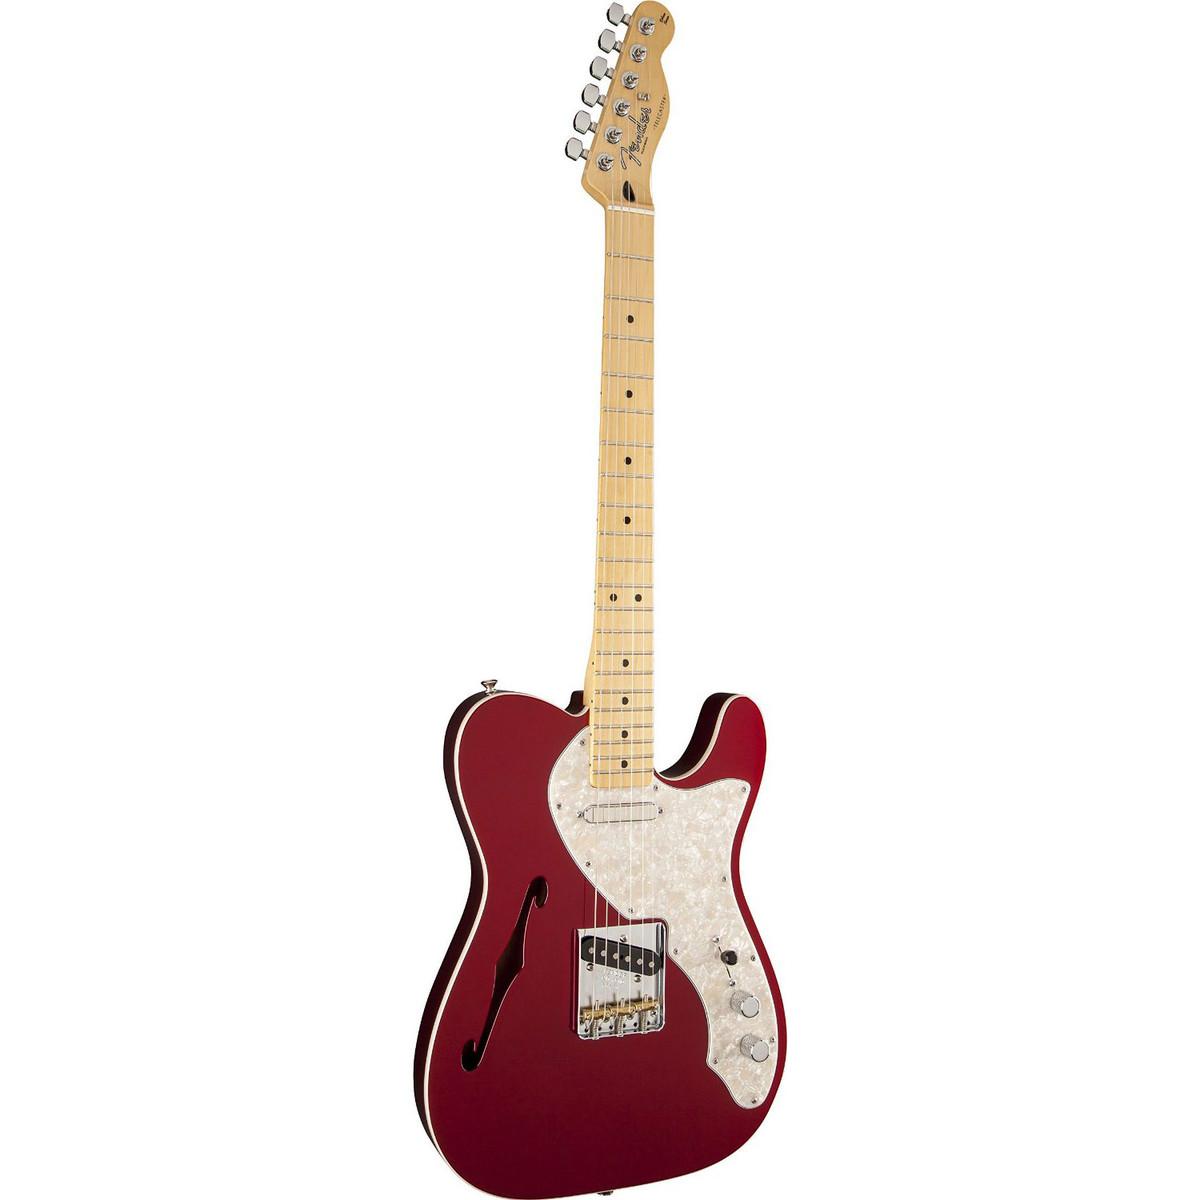 Fender FSR Deluxe Telecaster Thinline, MN, Candy Apple Red